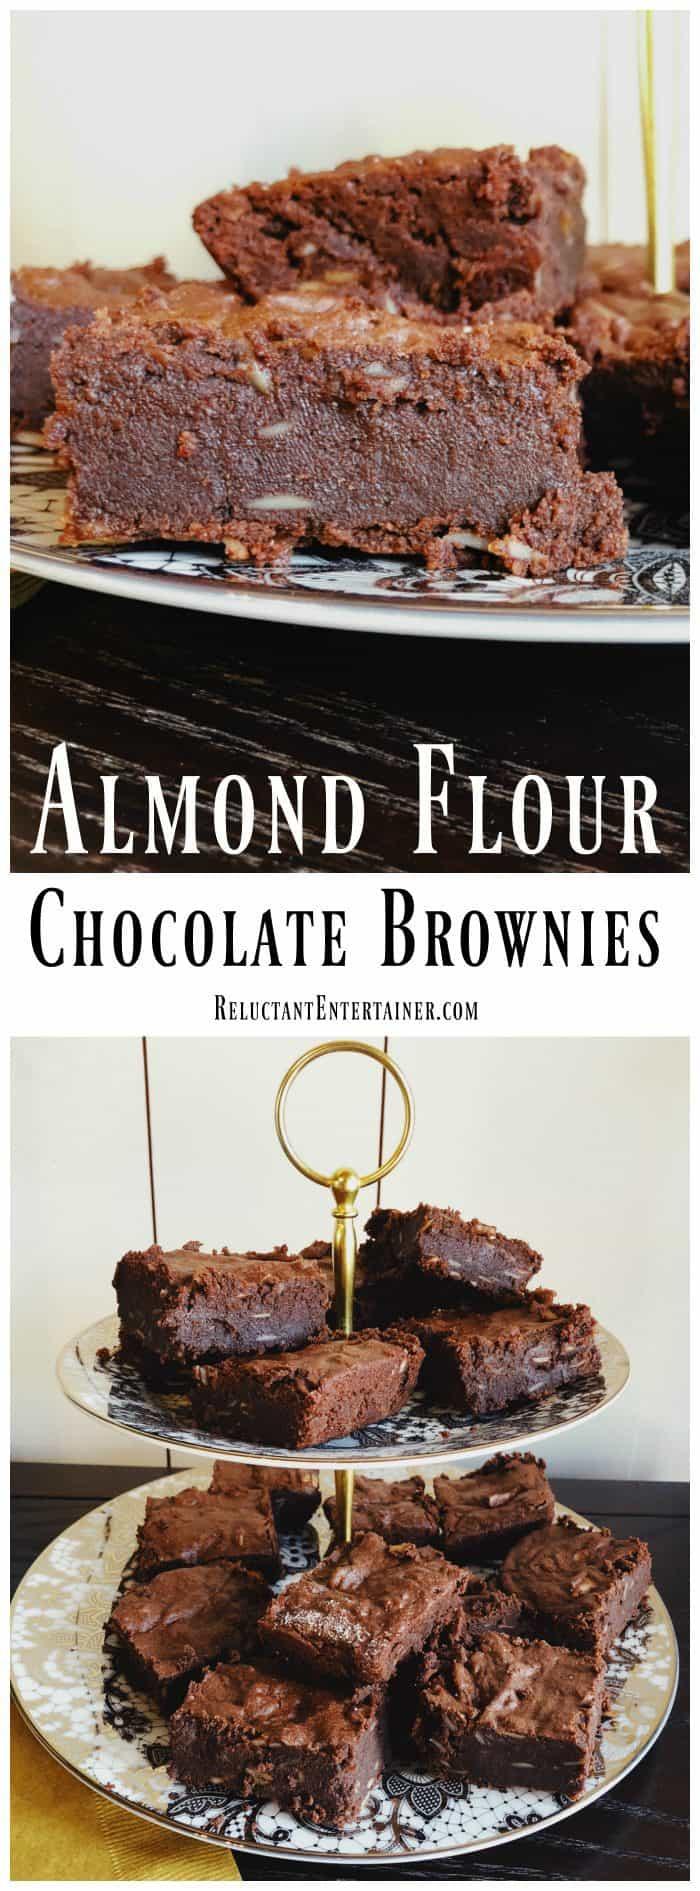 Almond Flour Chocolate Brownies